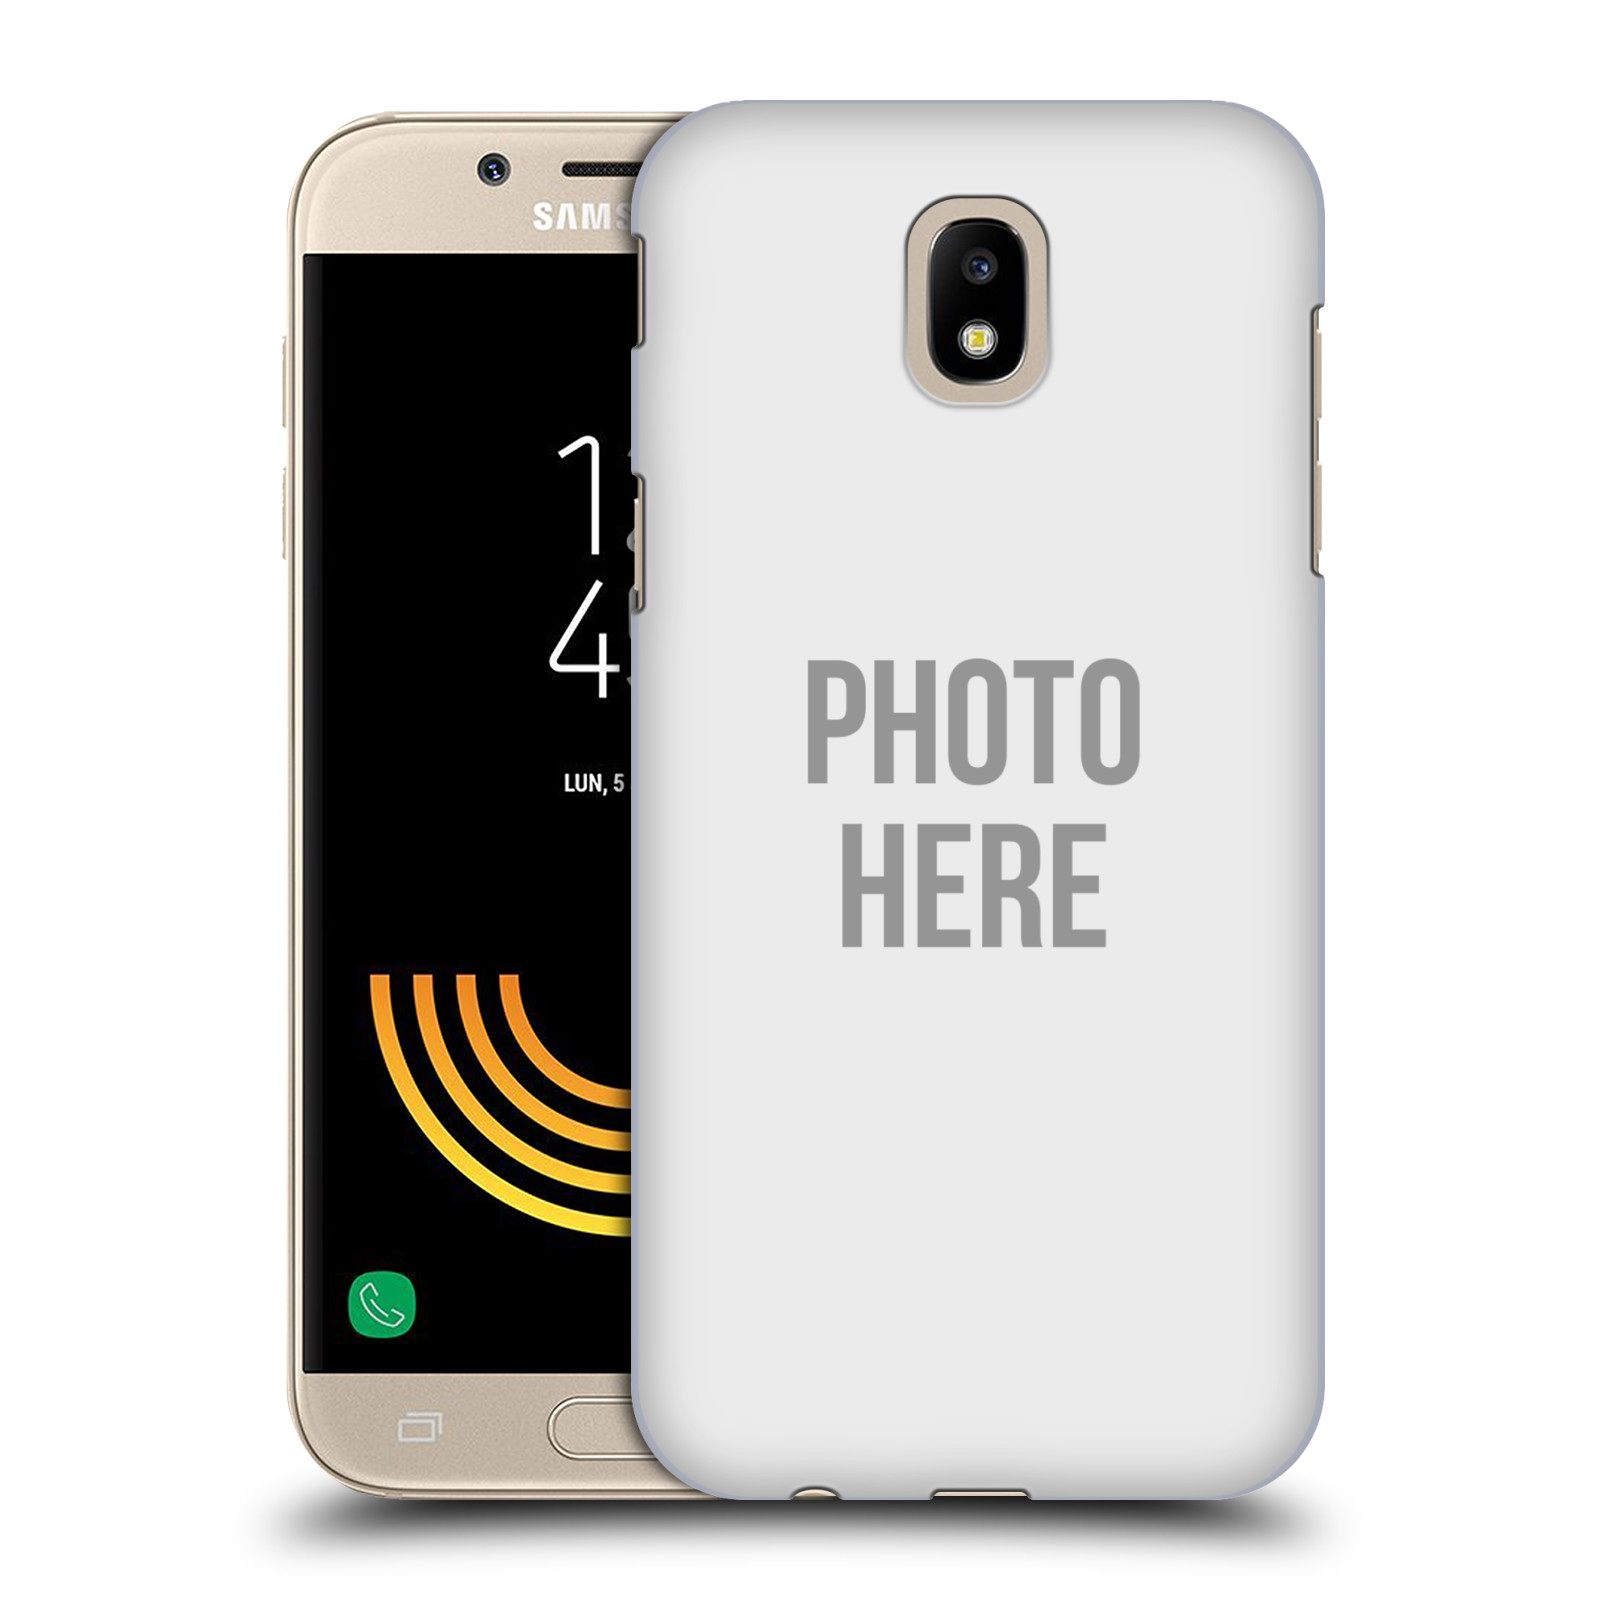 Plastové pouzdro na mobil Samsung Galaxy J5 (2017) - Head Case - s vlastním motivem